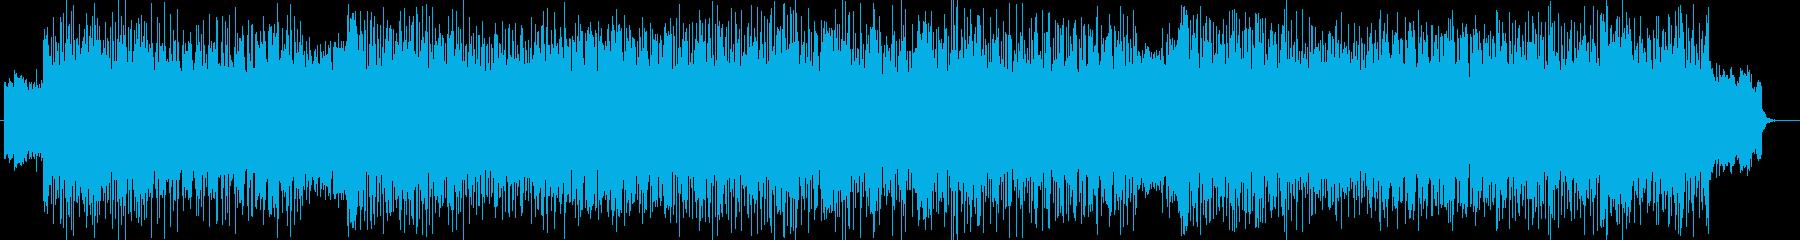 「HR/HM」「DARK」BGM265の再生済みの波形